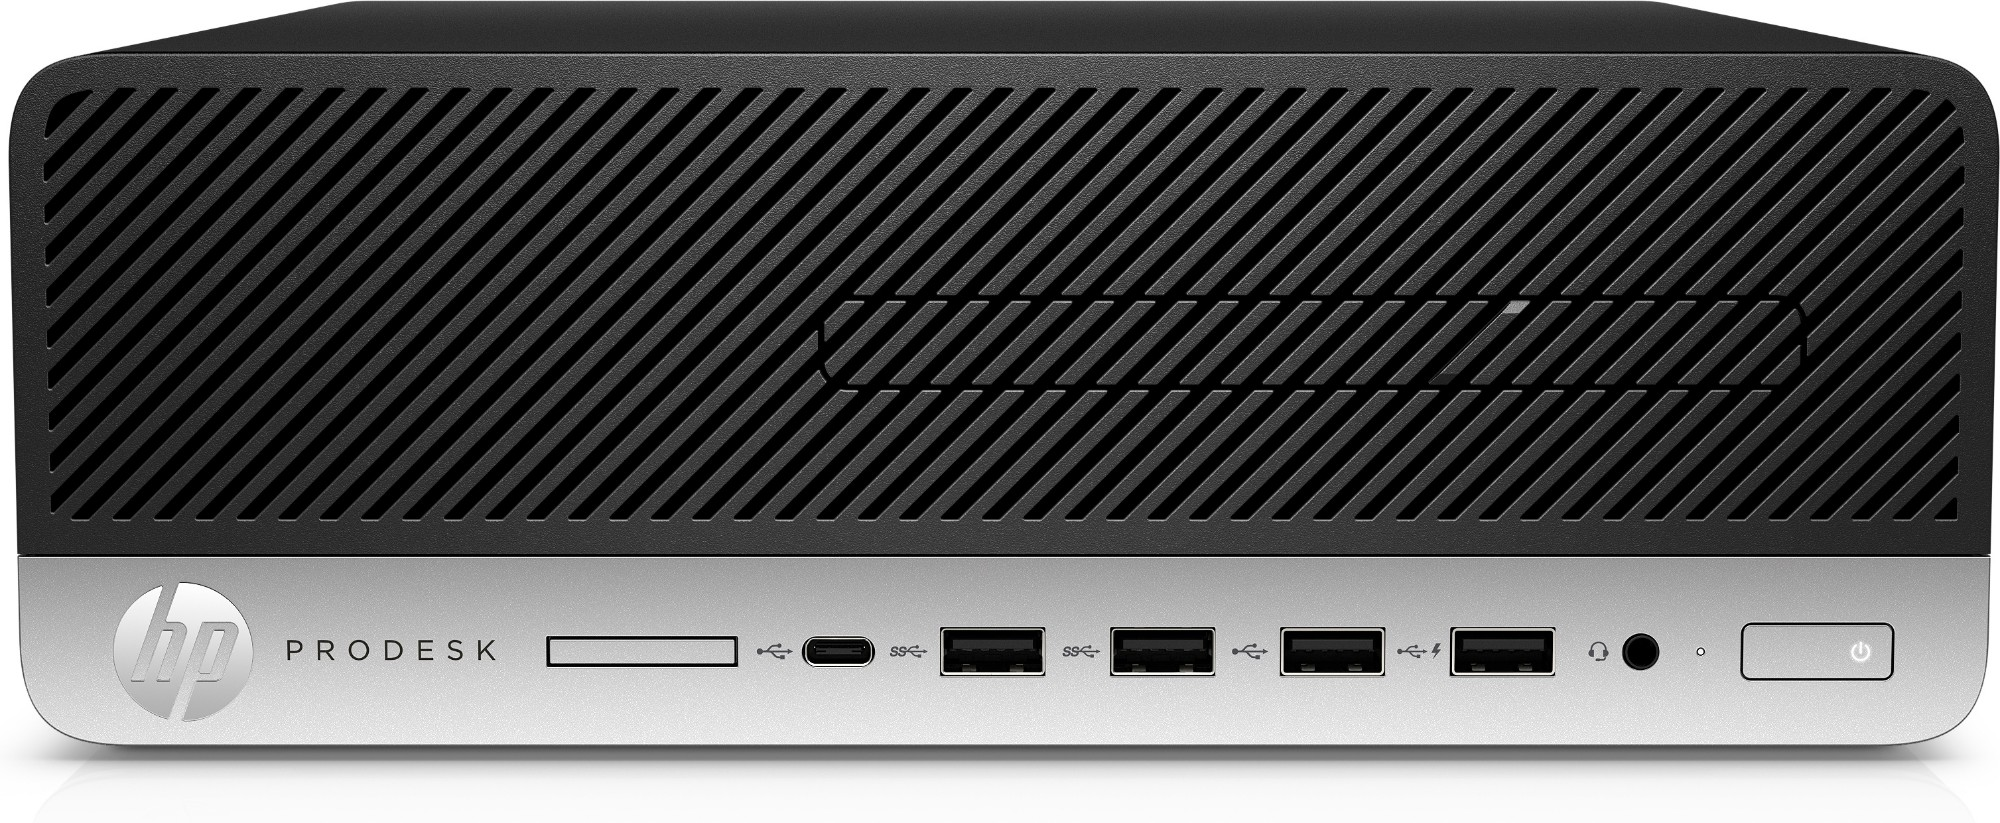 HP ProDesk 600 G3 Zevende generatie Intel® Core™ i7 i7-7700 8 GB DDR4-SDRAM 256 GB SSD Zwart SFF PC